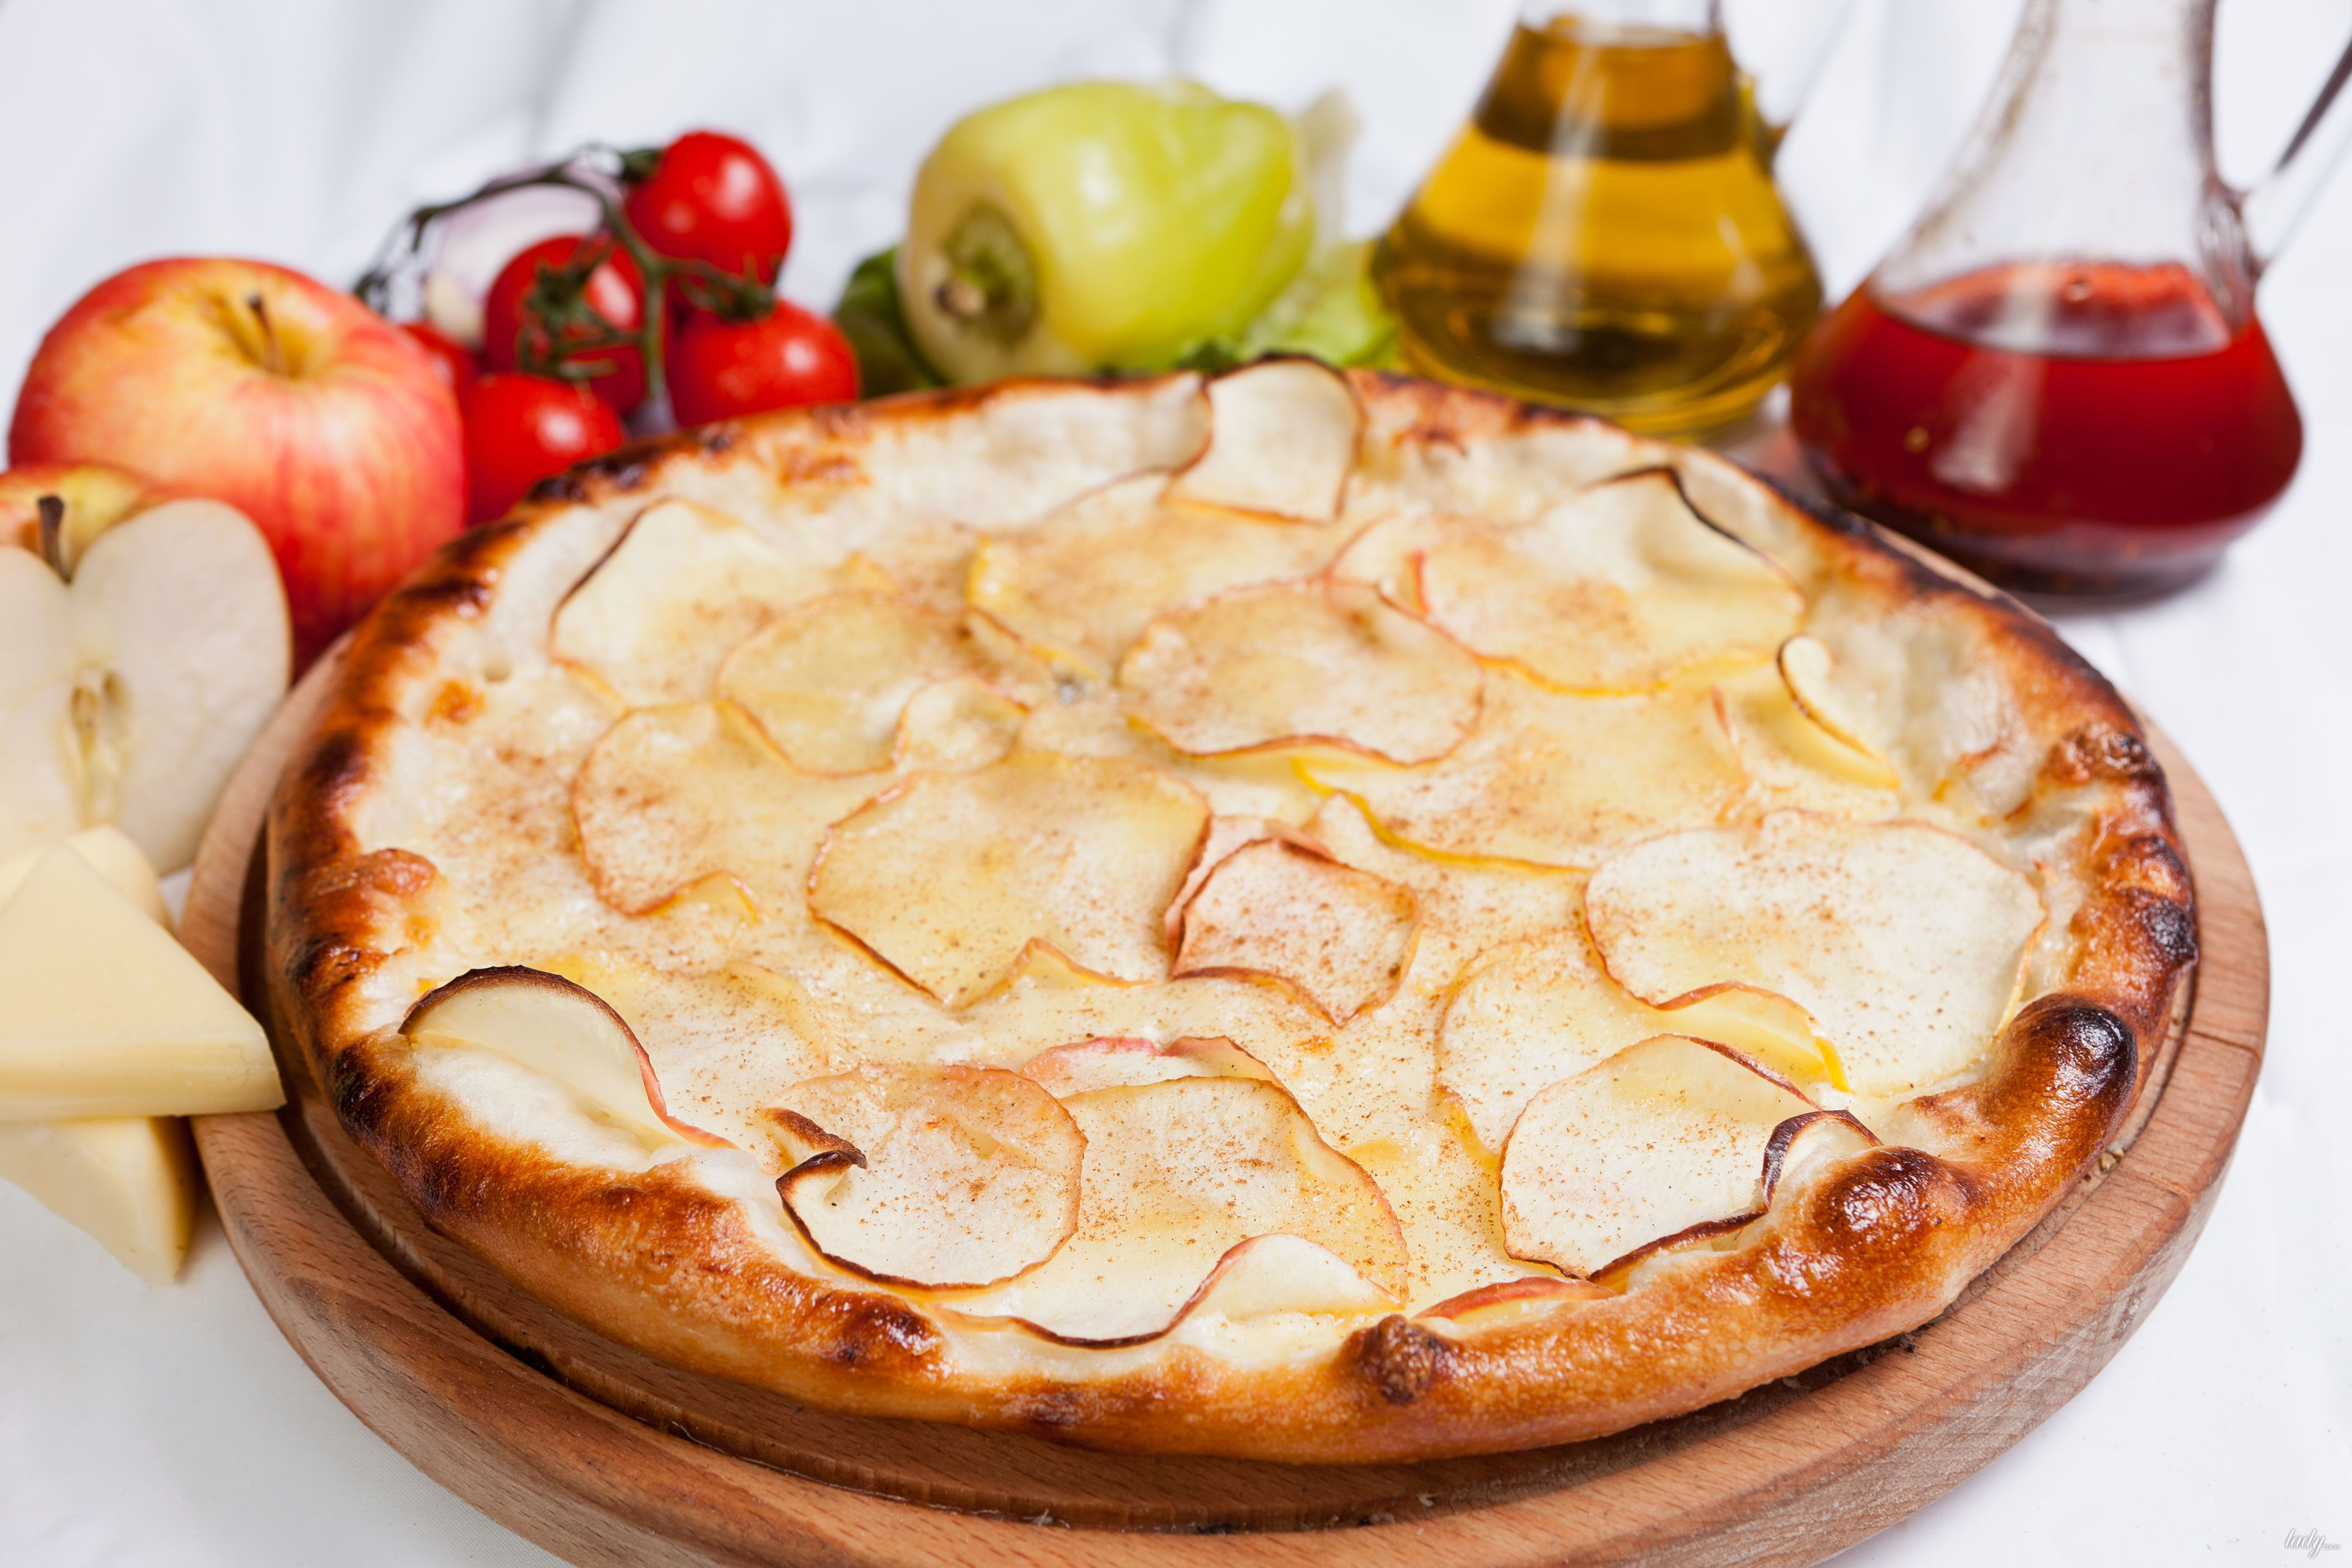 яблоки, еда, блюда_1